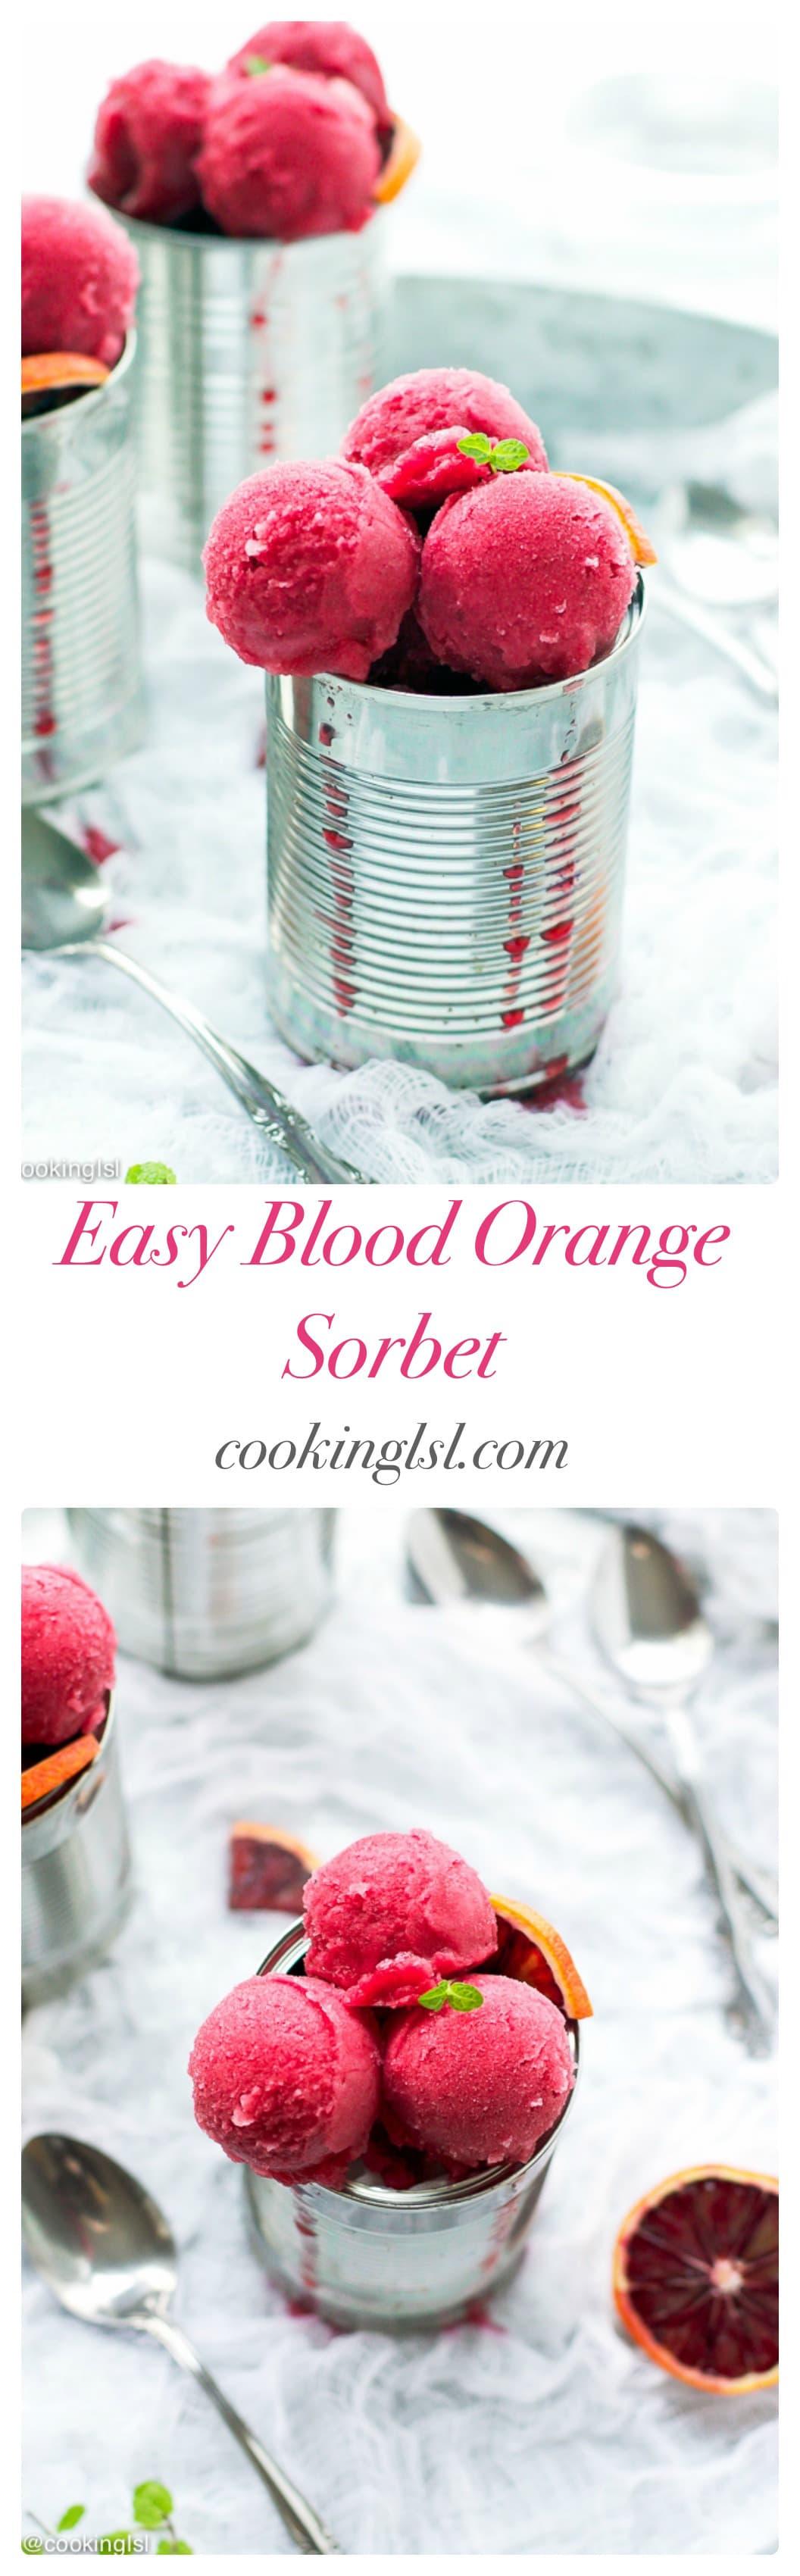 blood-orange-sorbet-recipe